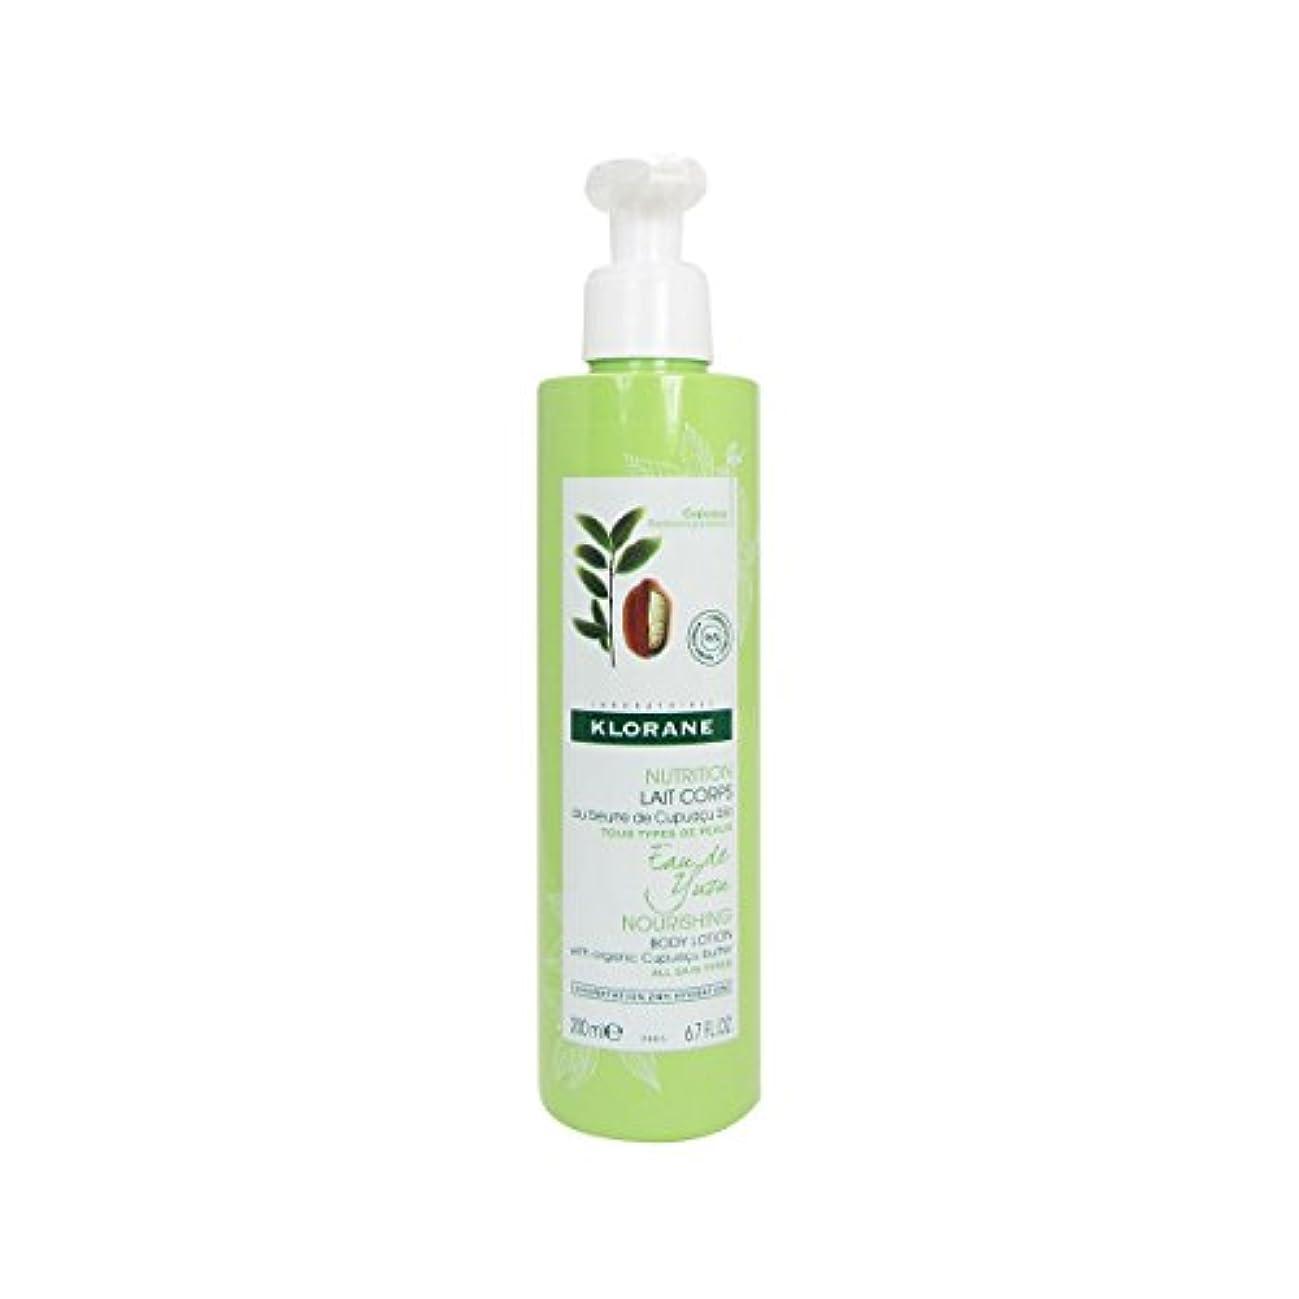 アリ過剰愛Klorane Nutrition Yuzu Water Body Milk 200ml [並行輸入品]